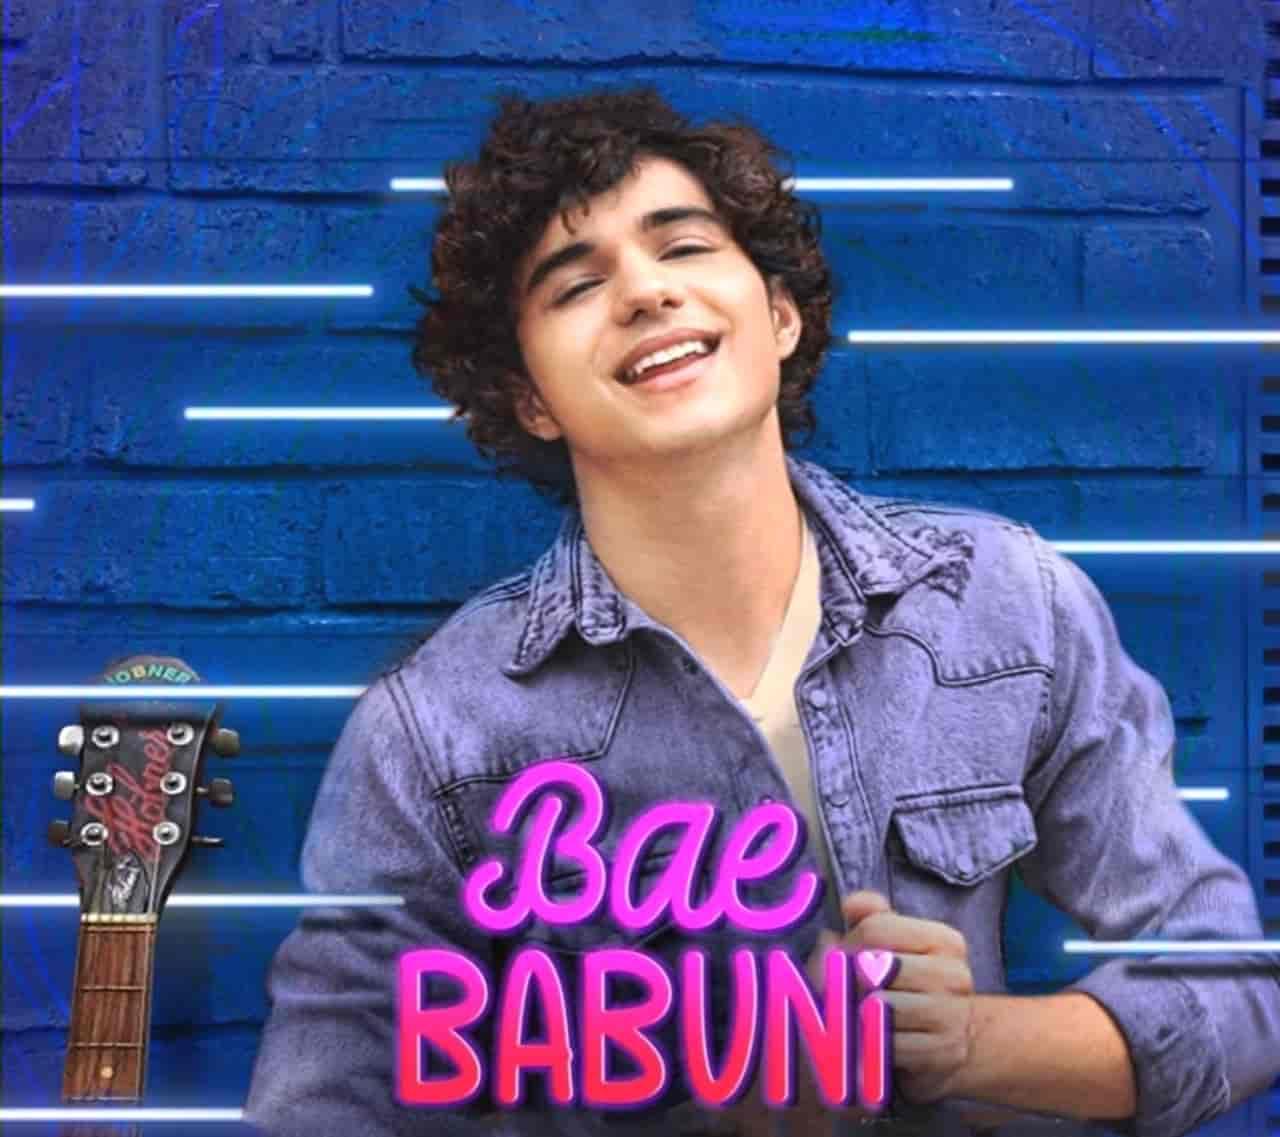 Bae Babuni Bhojpuri Song Image Features Abhay Verma Sung By Vivek Hariharan